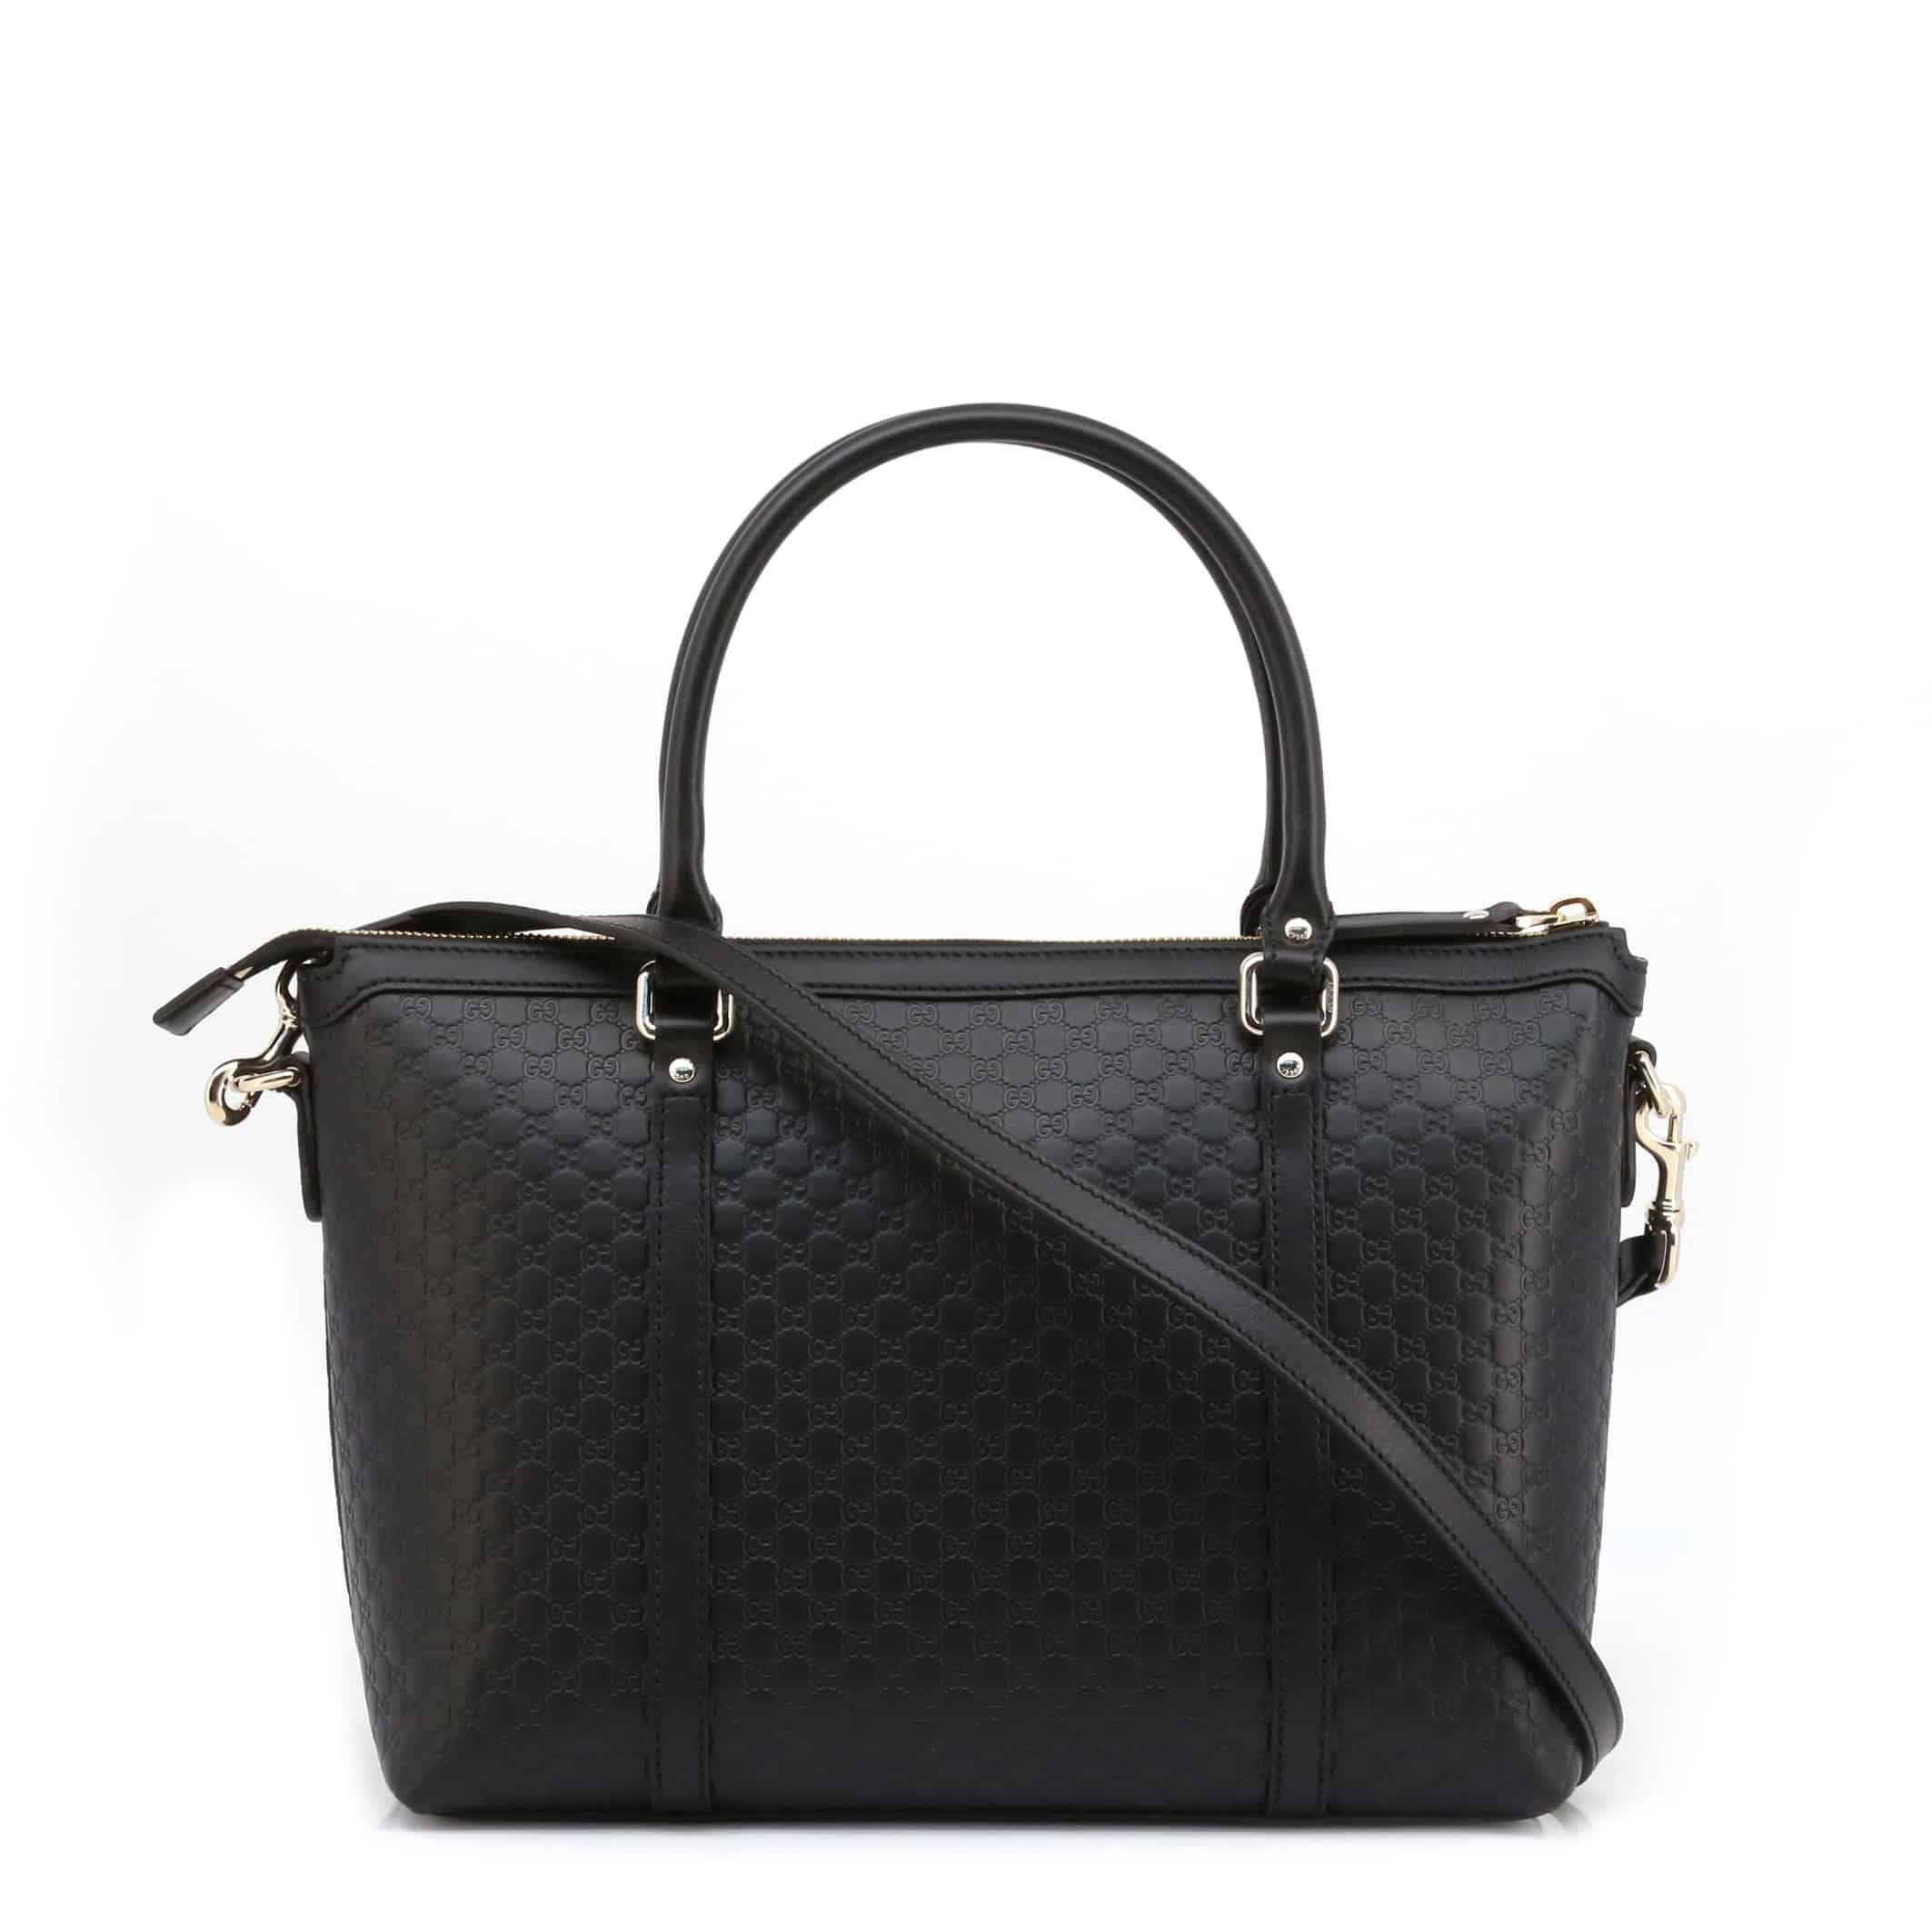 Gucci – 449656_BMJ1G – Zwart Designeritems.nl